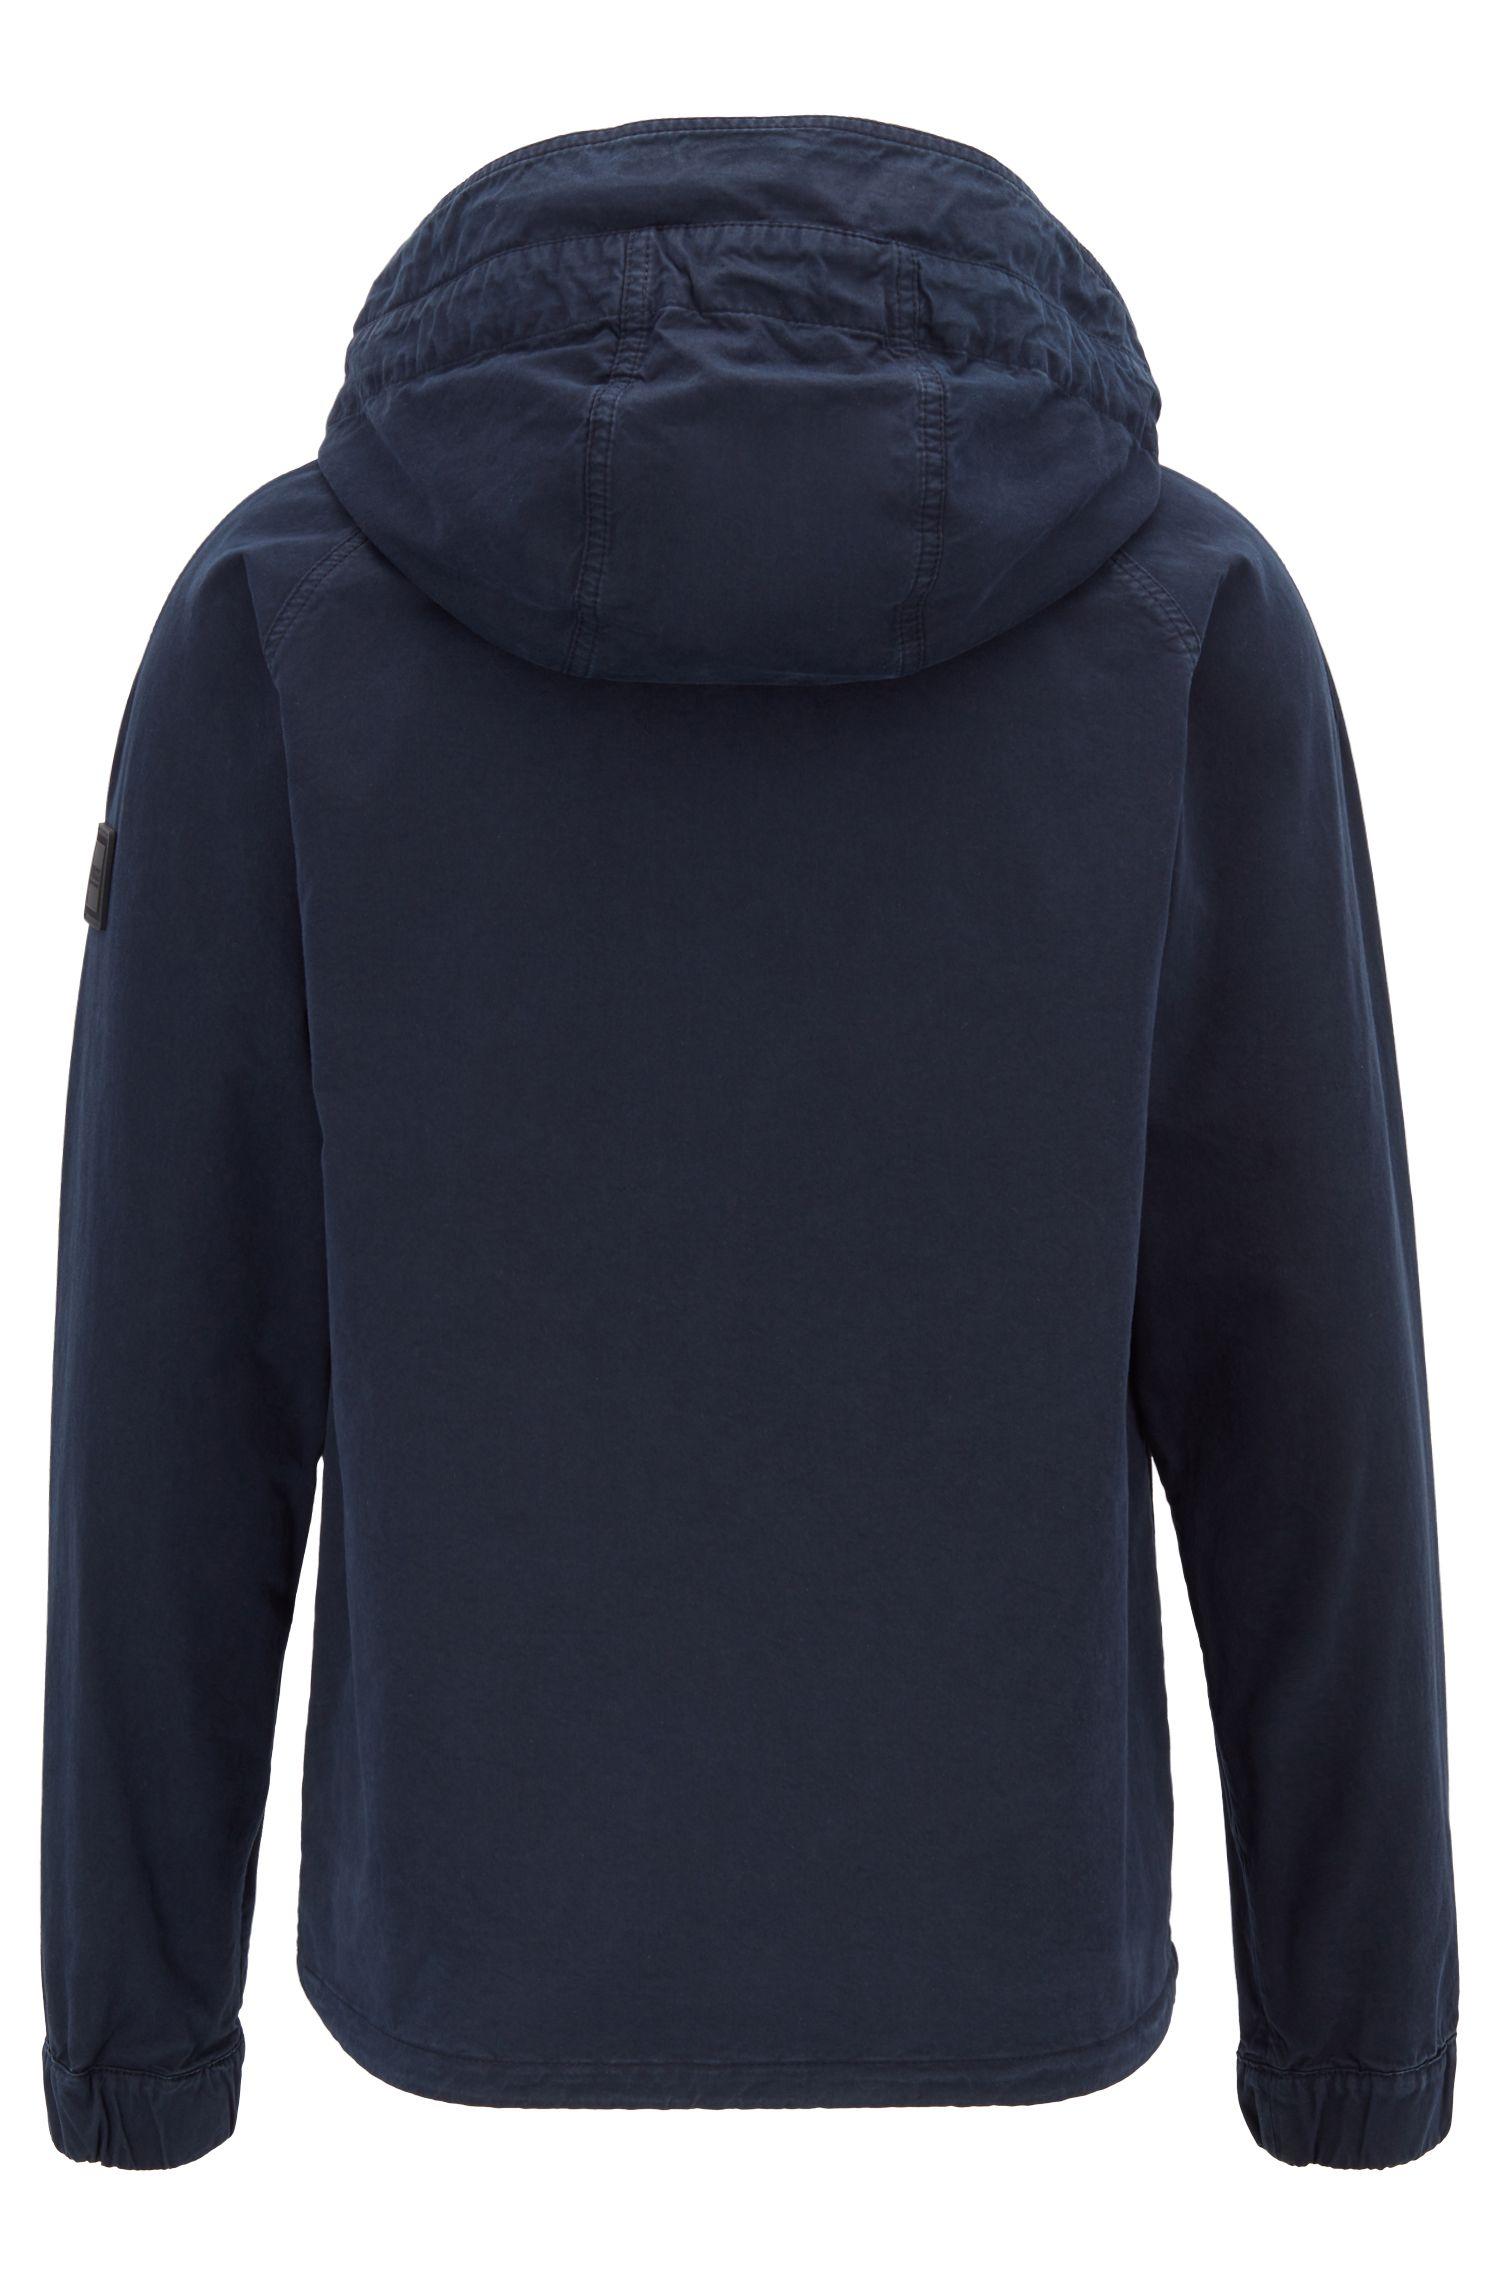 Regular-fit hooded jacket in cotton twill, Dark Blue